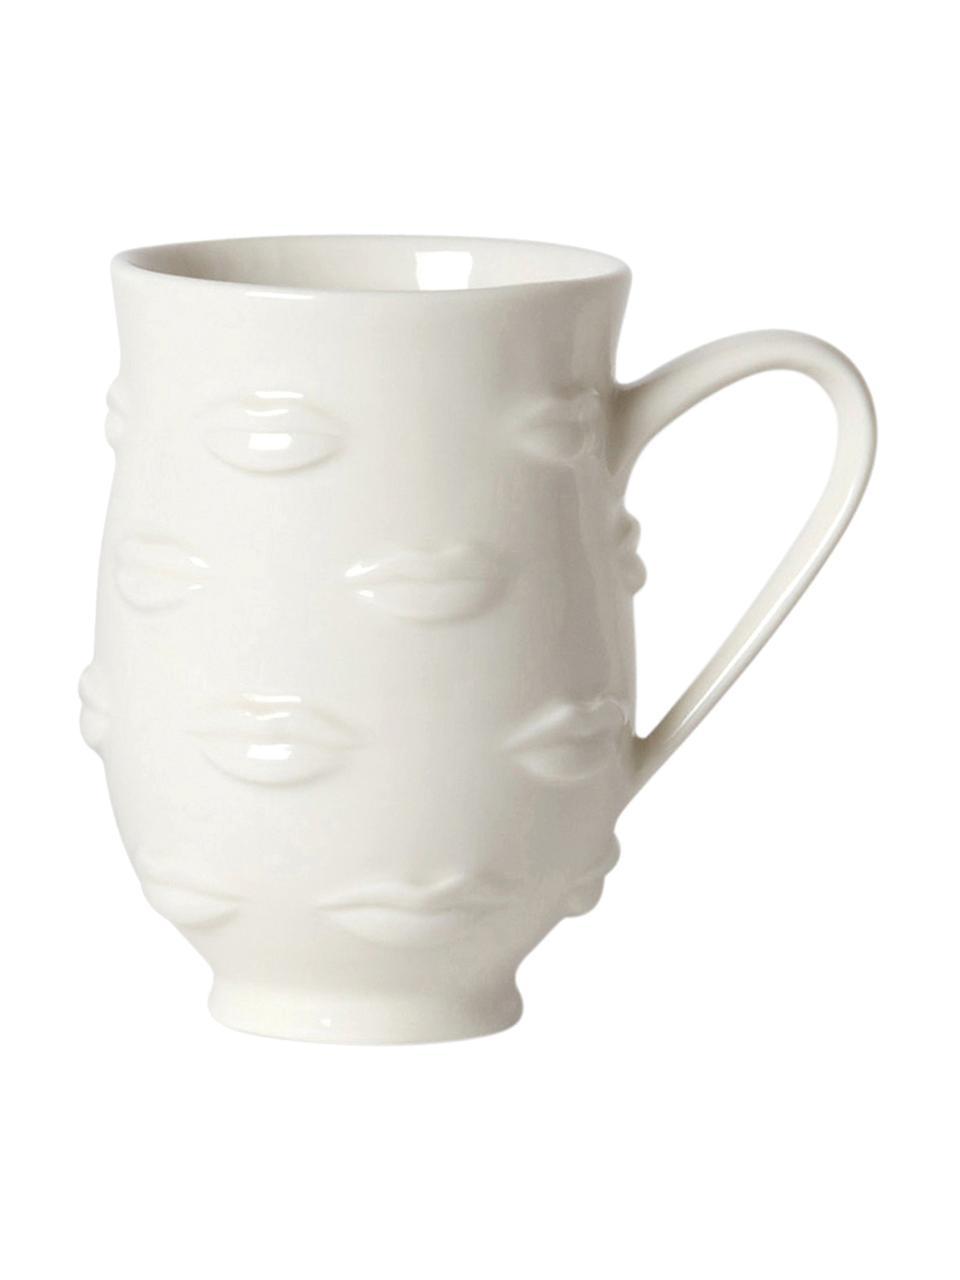 Designer mok Gala, Porselein, Wit, Ø 9 x H 13 cm